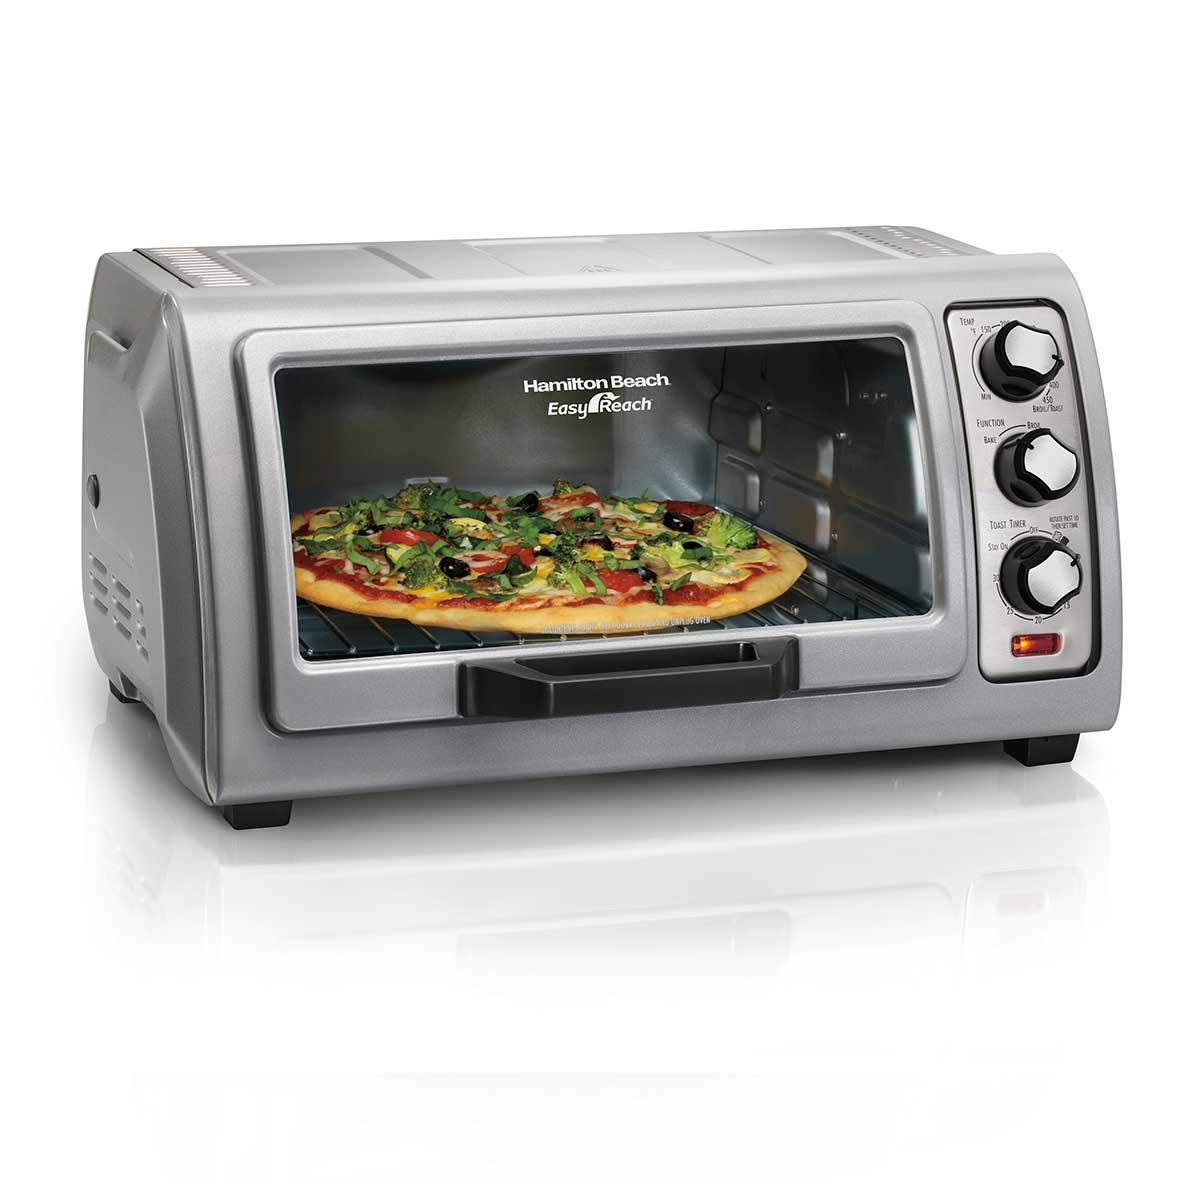 Easy Reach® Toaster Oven with Roll-Top Door (31127D)